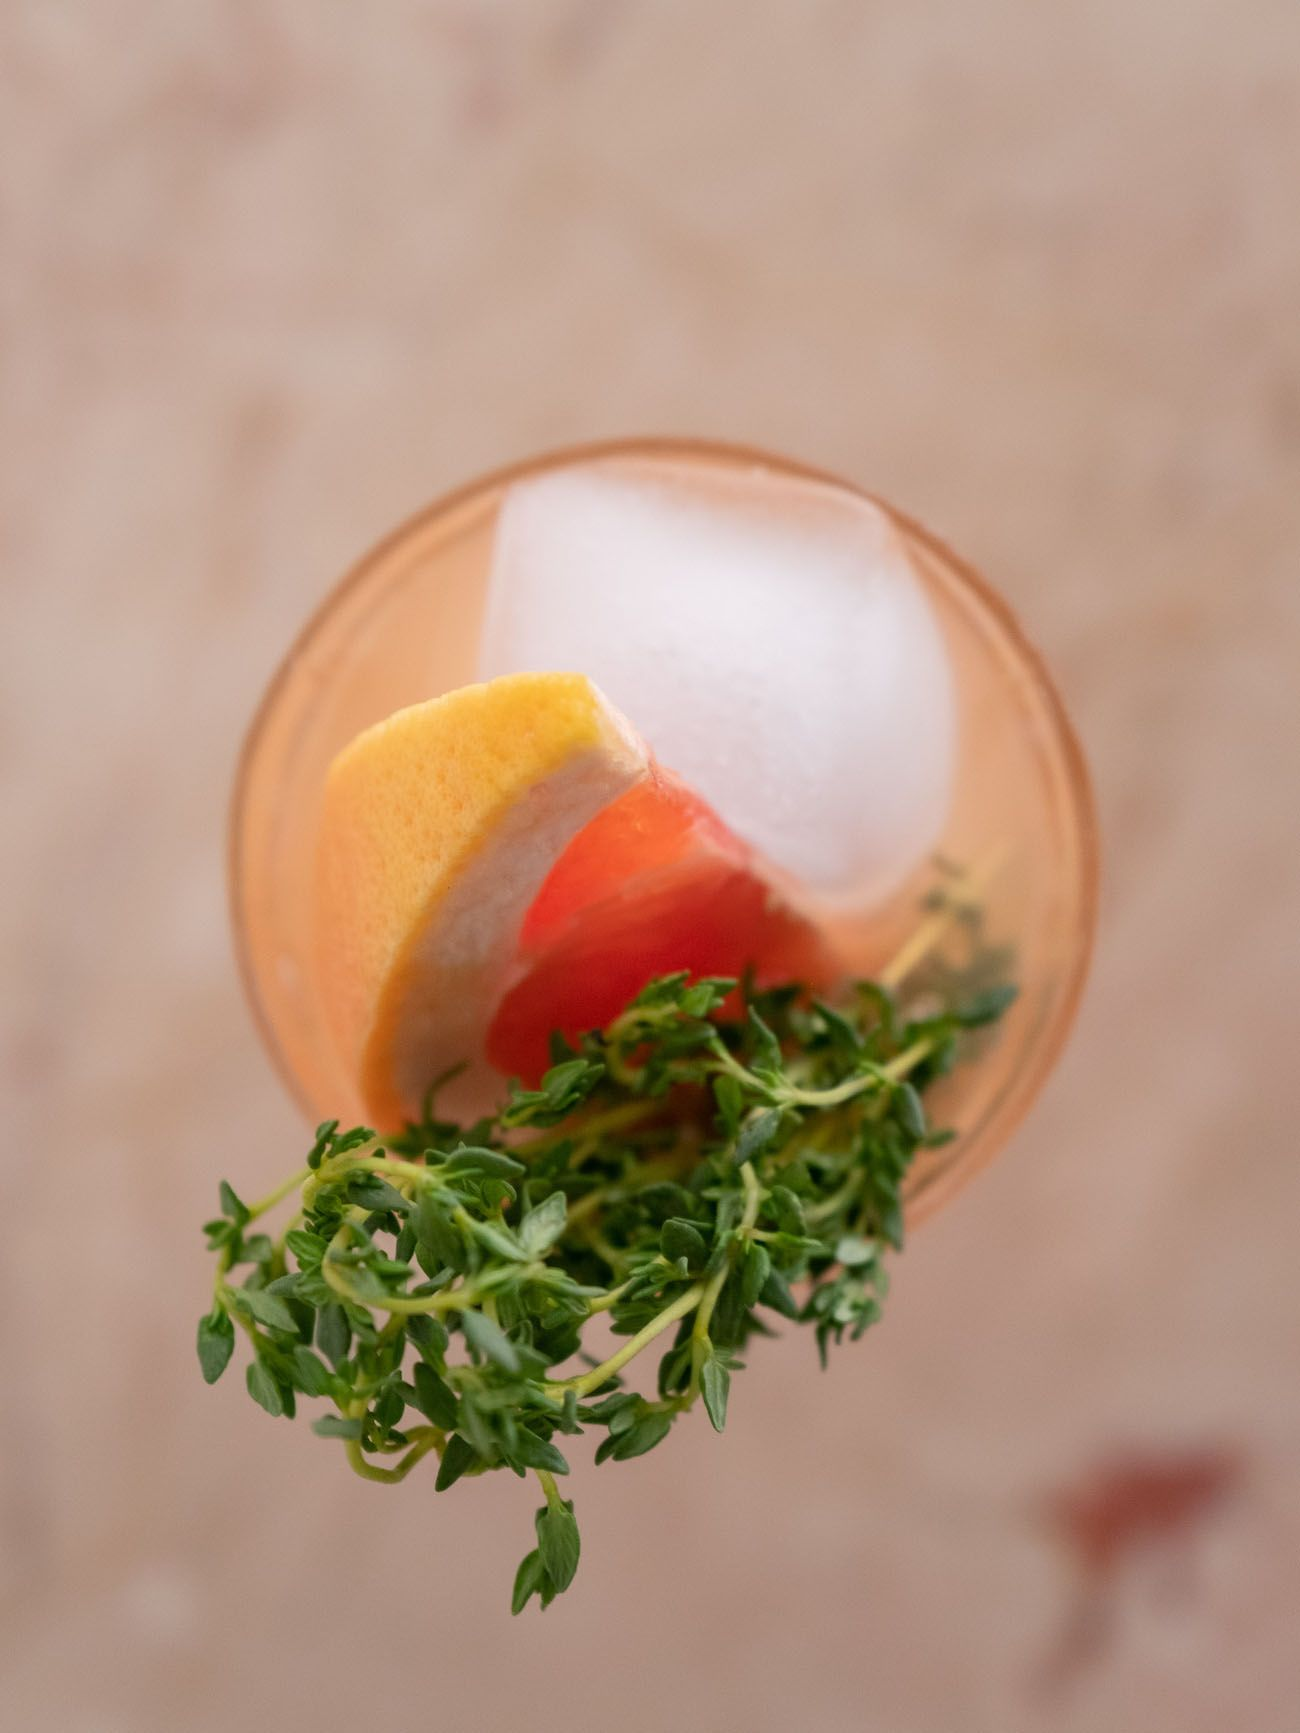 Foodblog, About Fuel, Soda Stream, Sirup, Rezept, Pink Grapefruit mit Thymian, Glas, Limonade, Eiswürfel